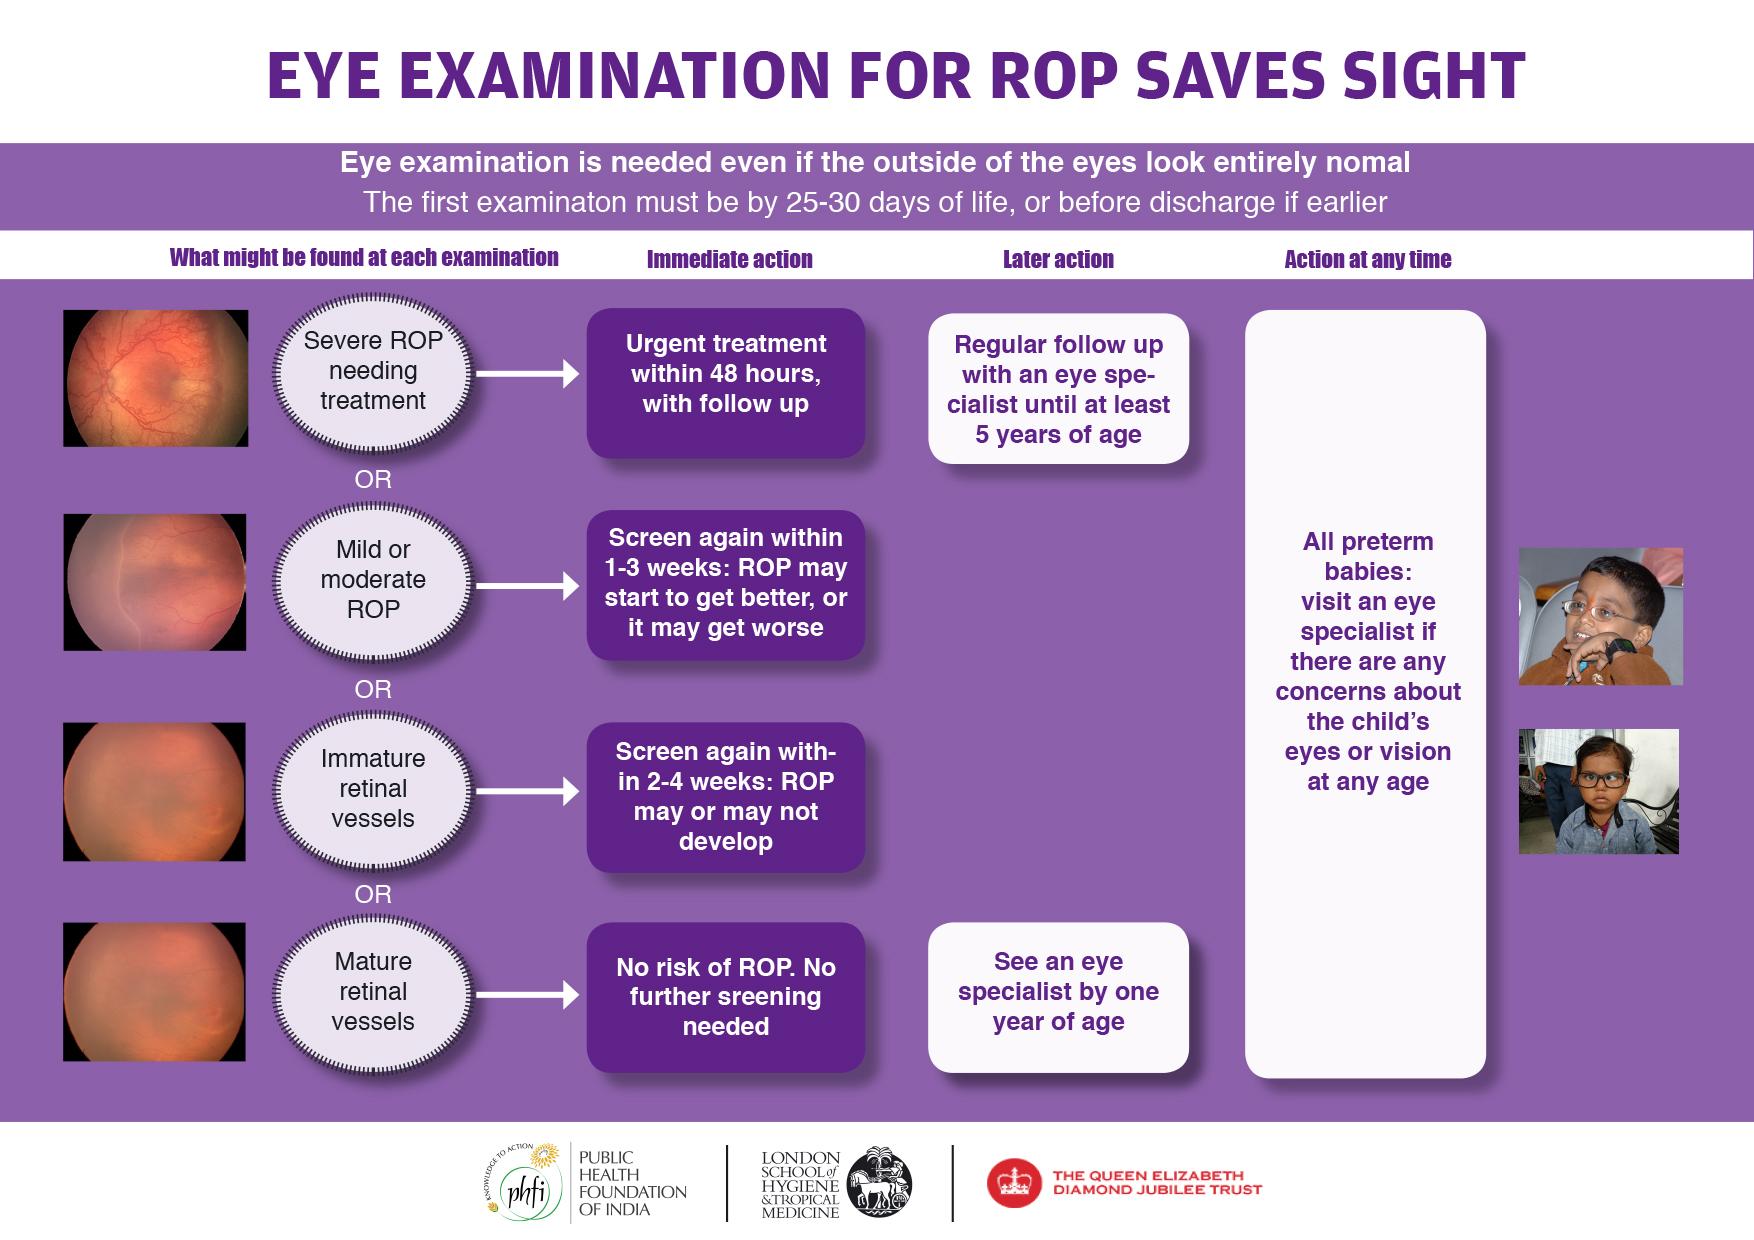 ROP3g-Screening-for-ROP-poster-FINAL-draft